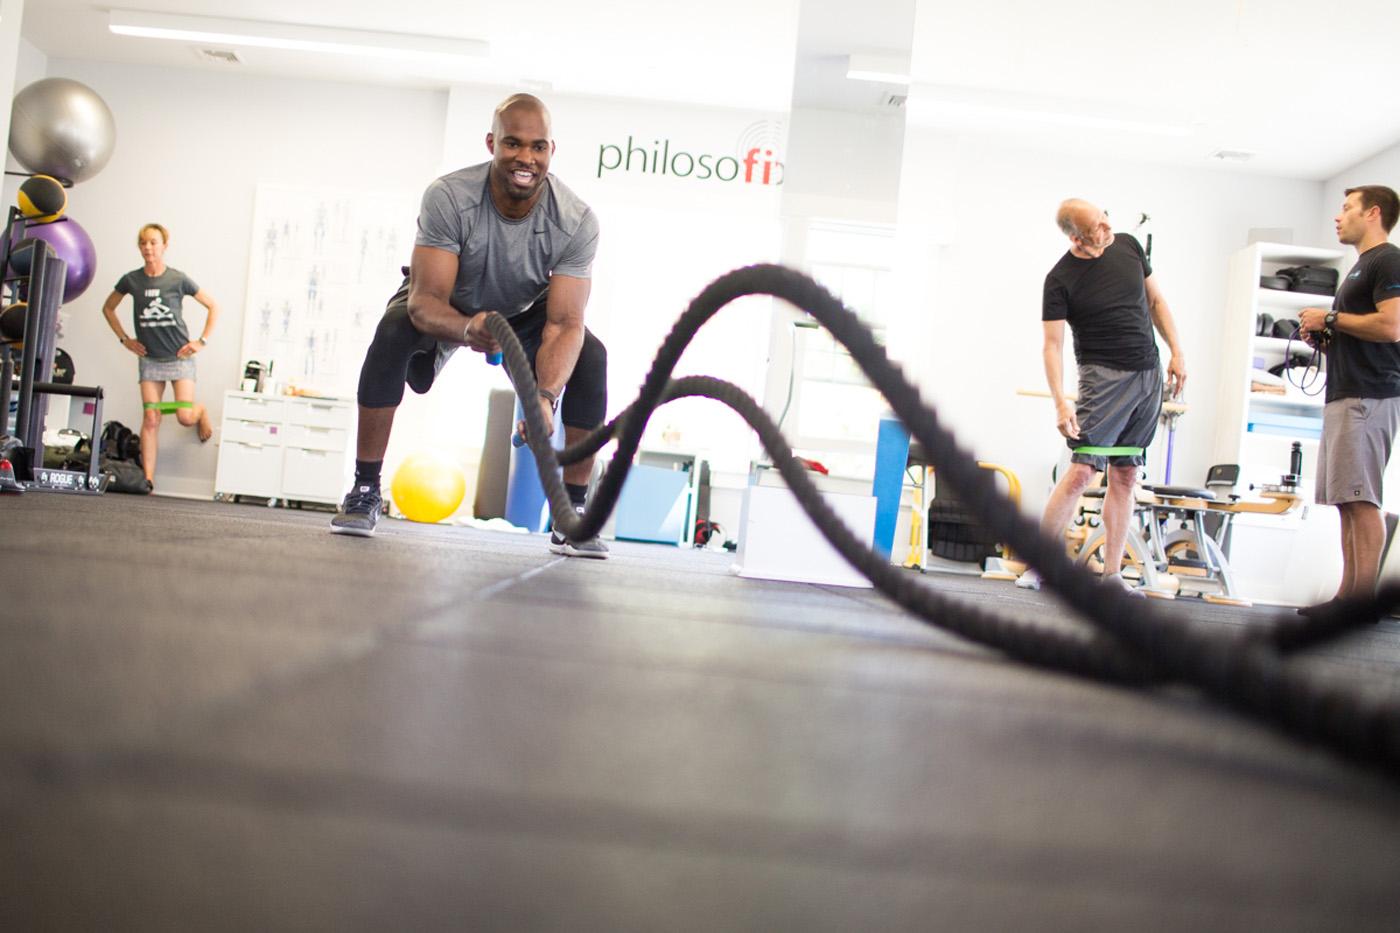 Philosofit_East_Hamptons_Fitness_Personal_Training_0401.jpg